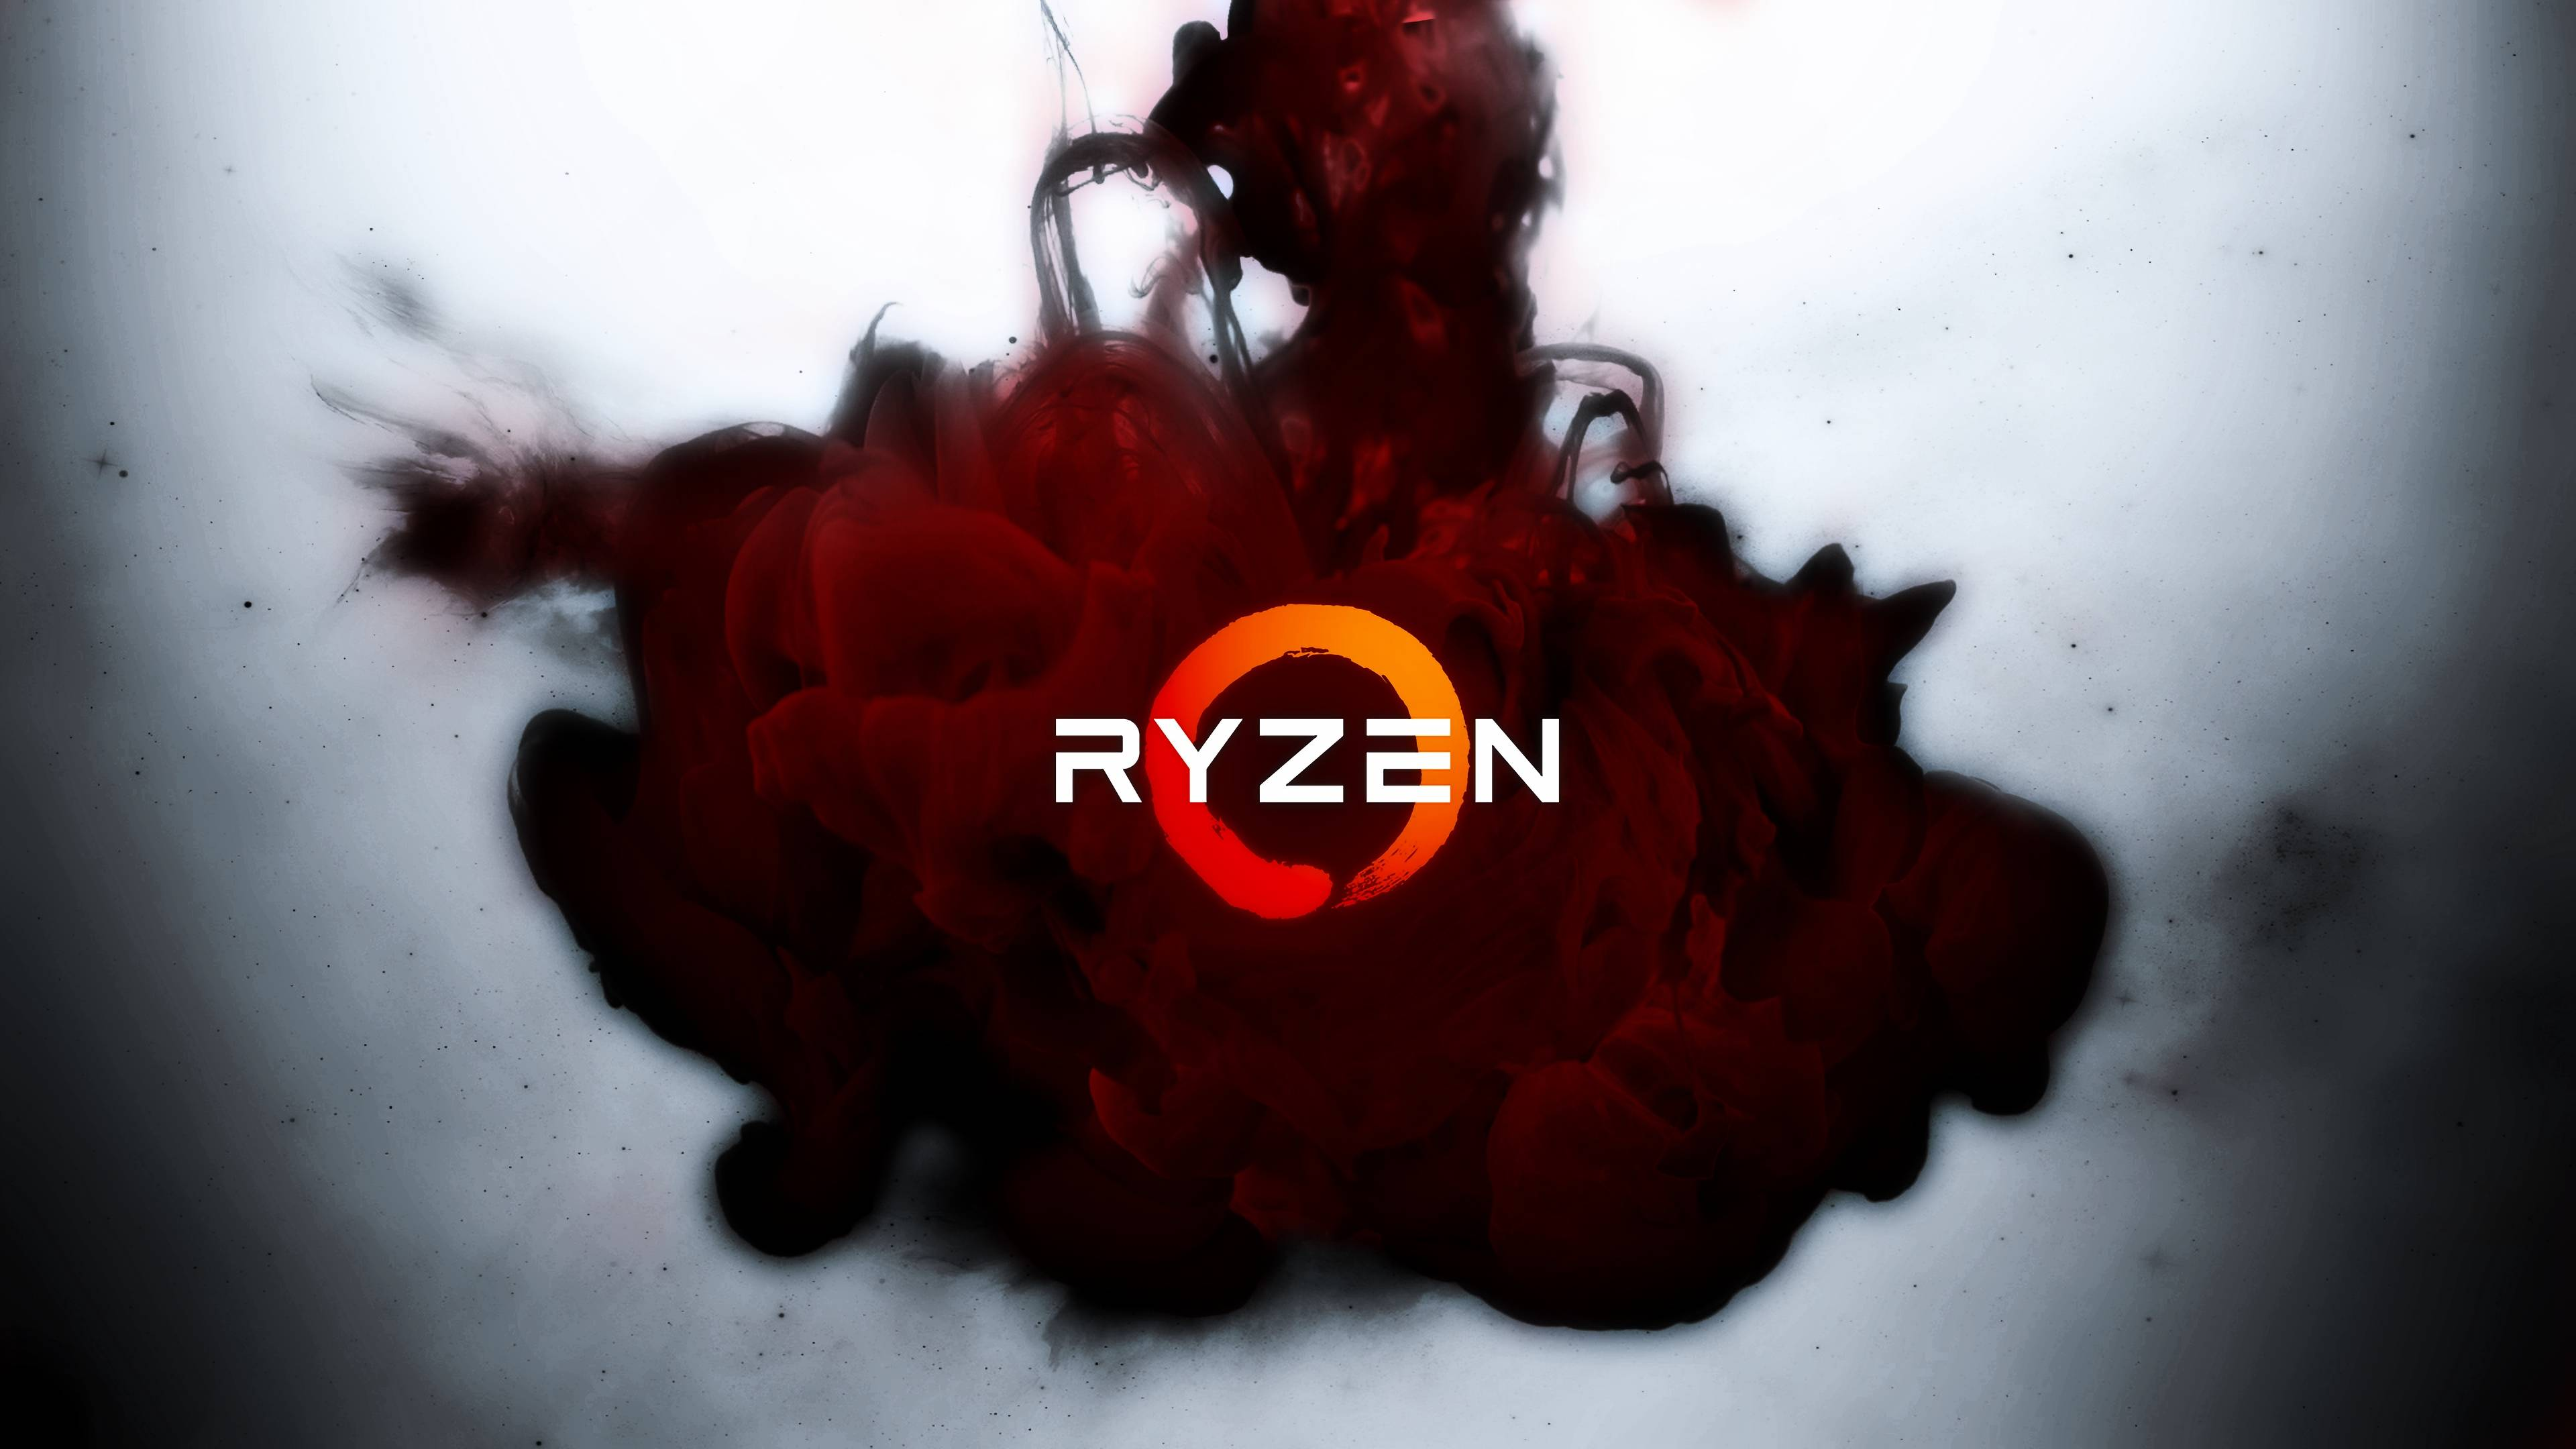 Ryzen 4k Wallpapers Top Free Ryzen 4k Backgrounds Wallpaperaccess